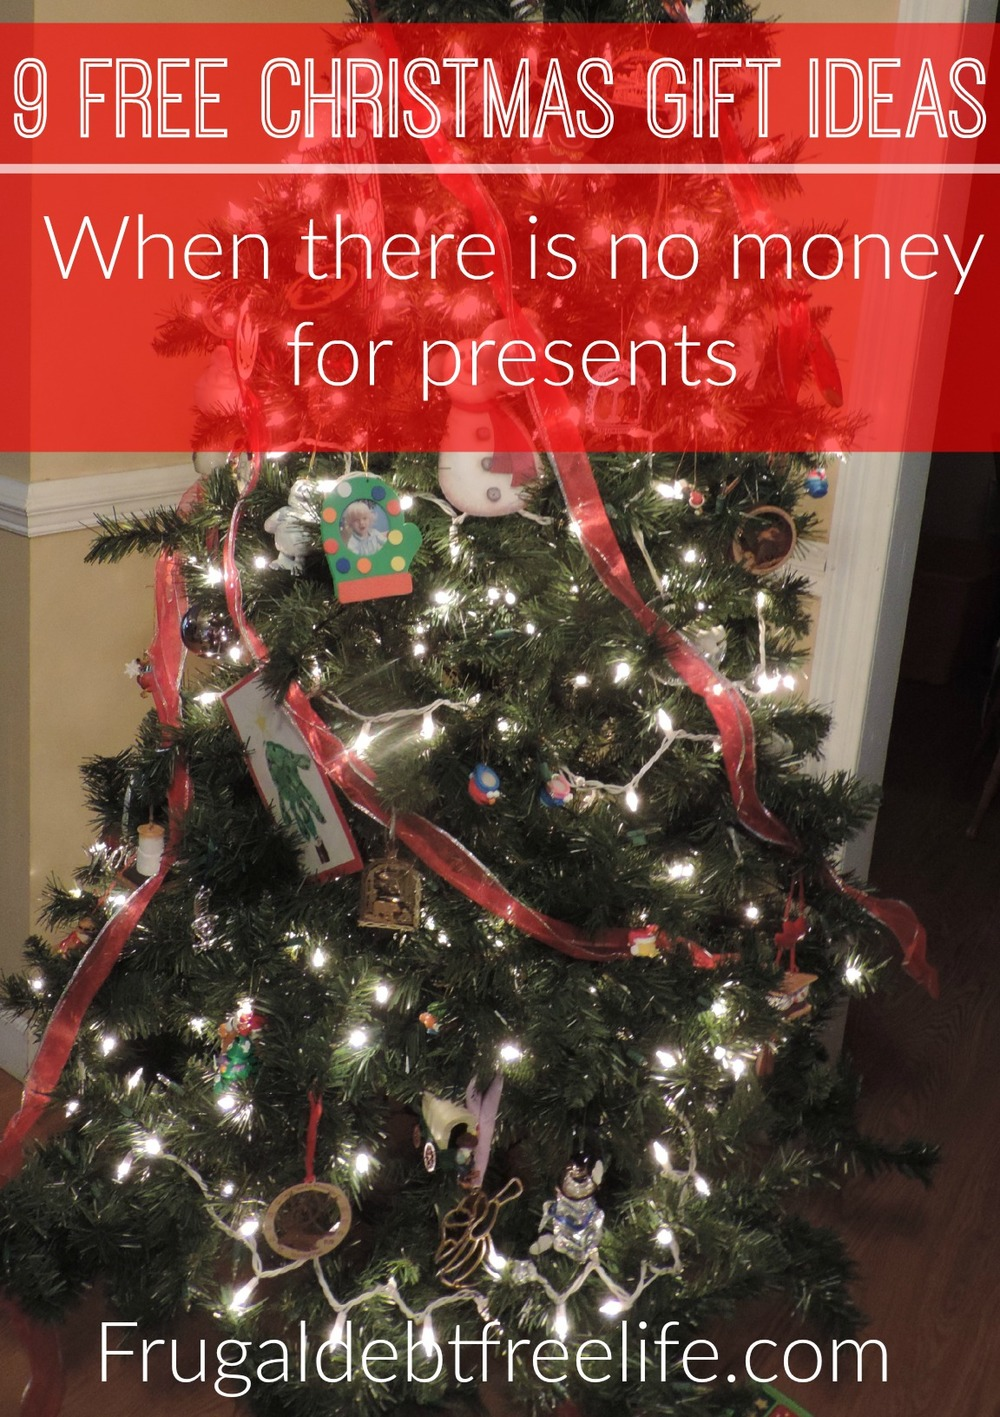 Gift free christmas ideas